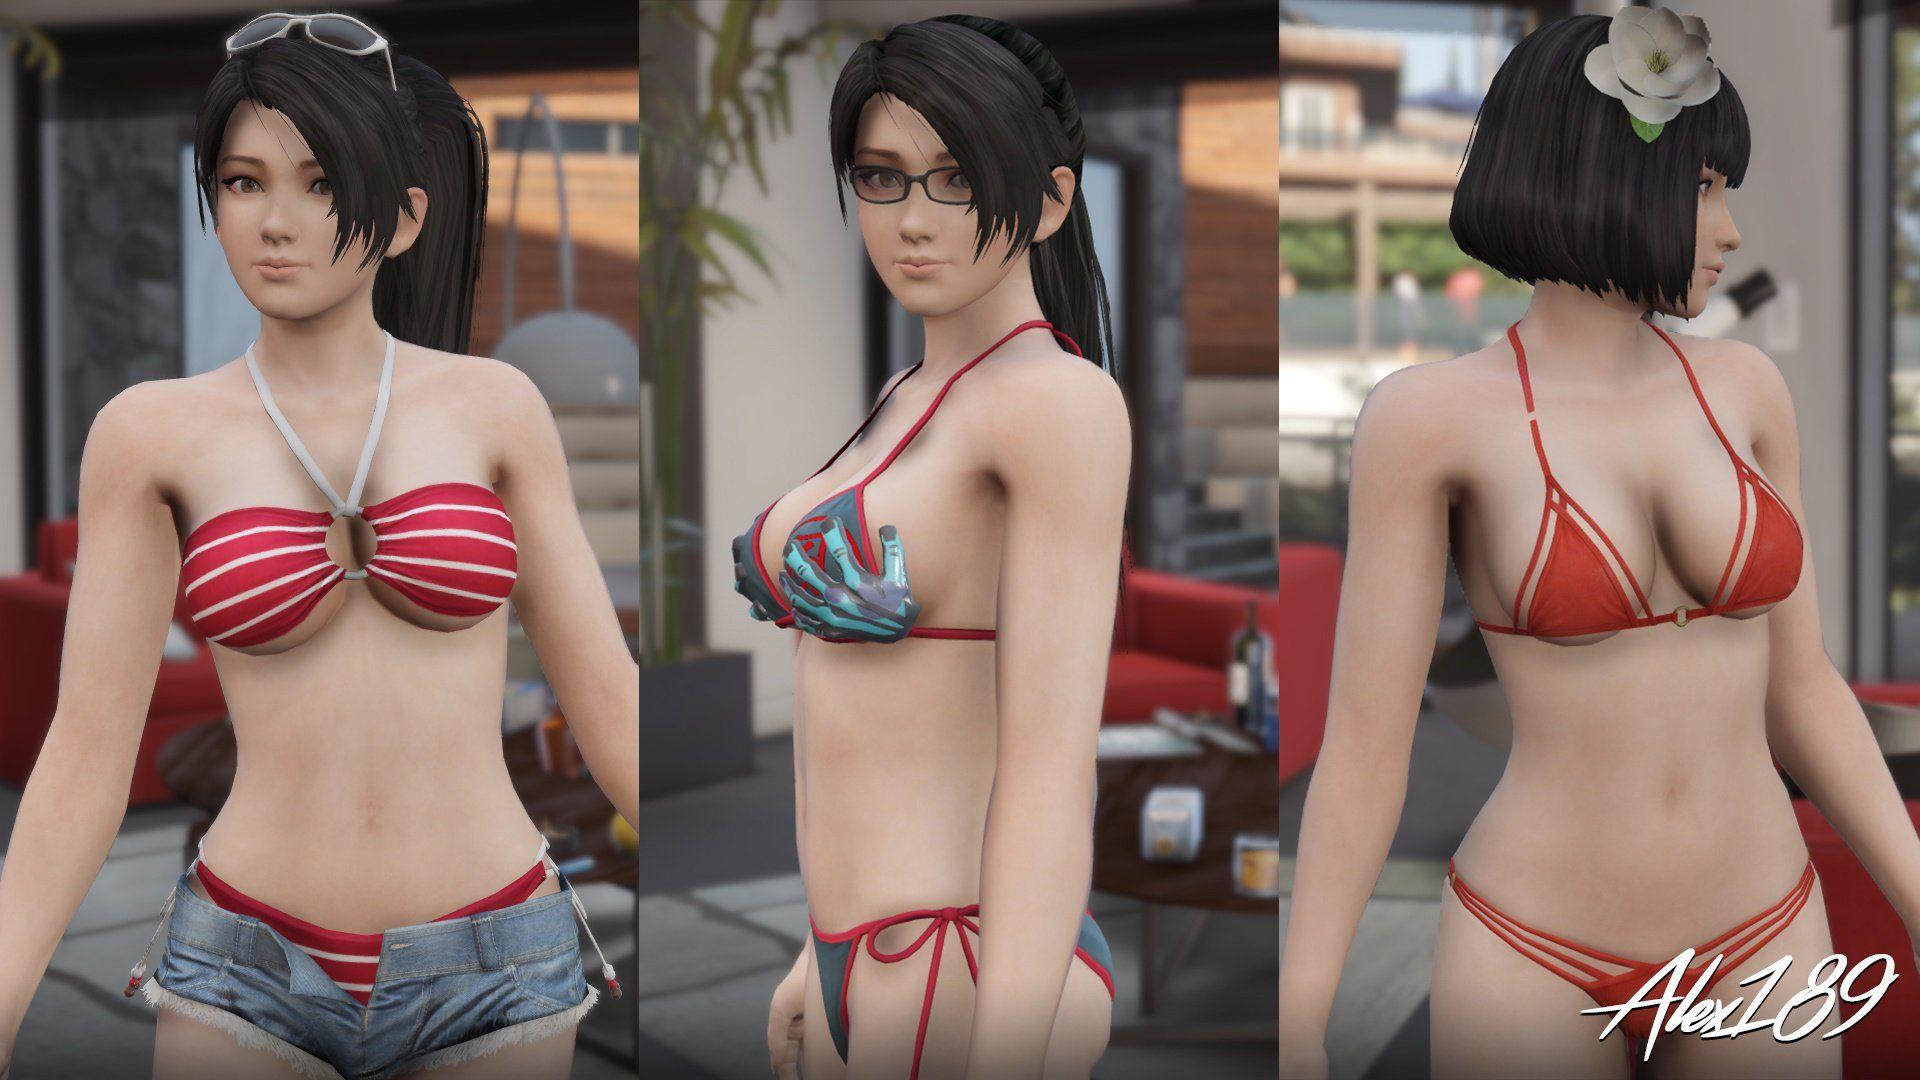 Momiji Bikini Mod Gta V Download Link And Videos -6209